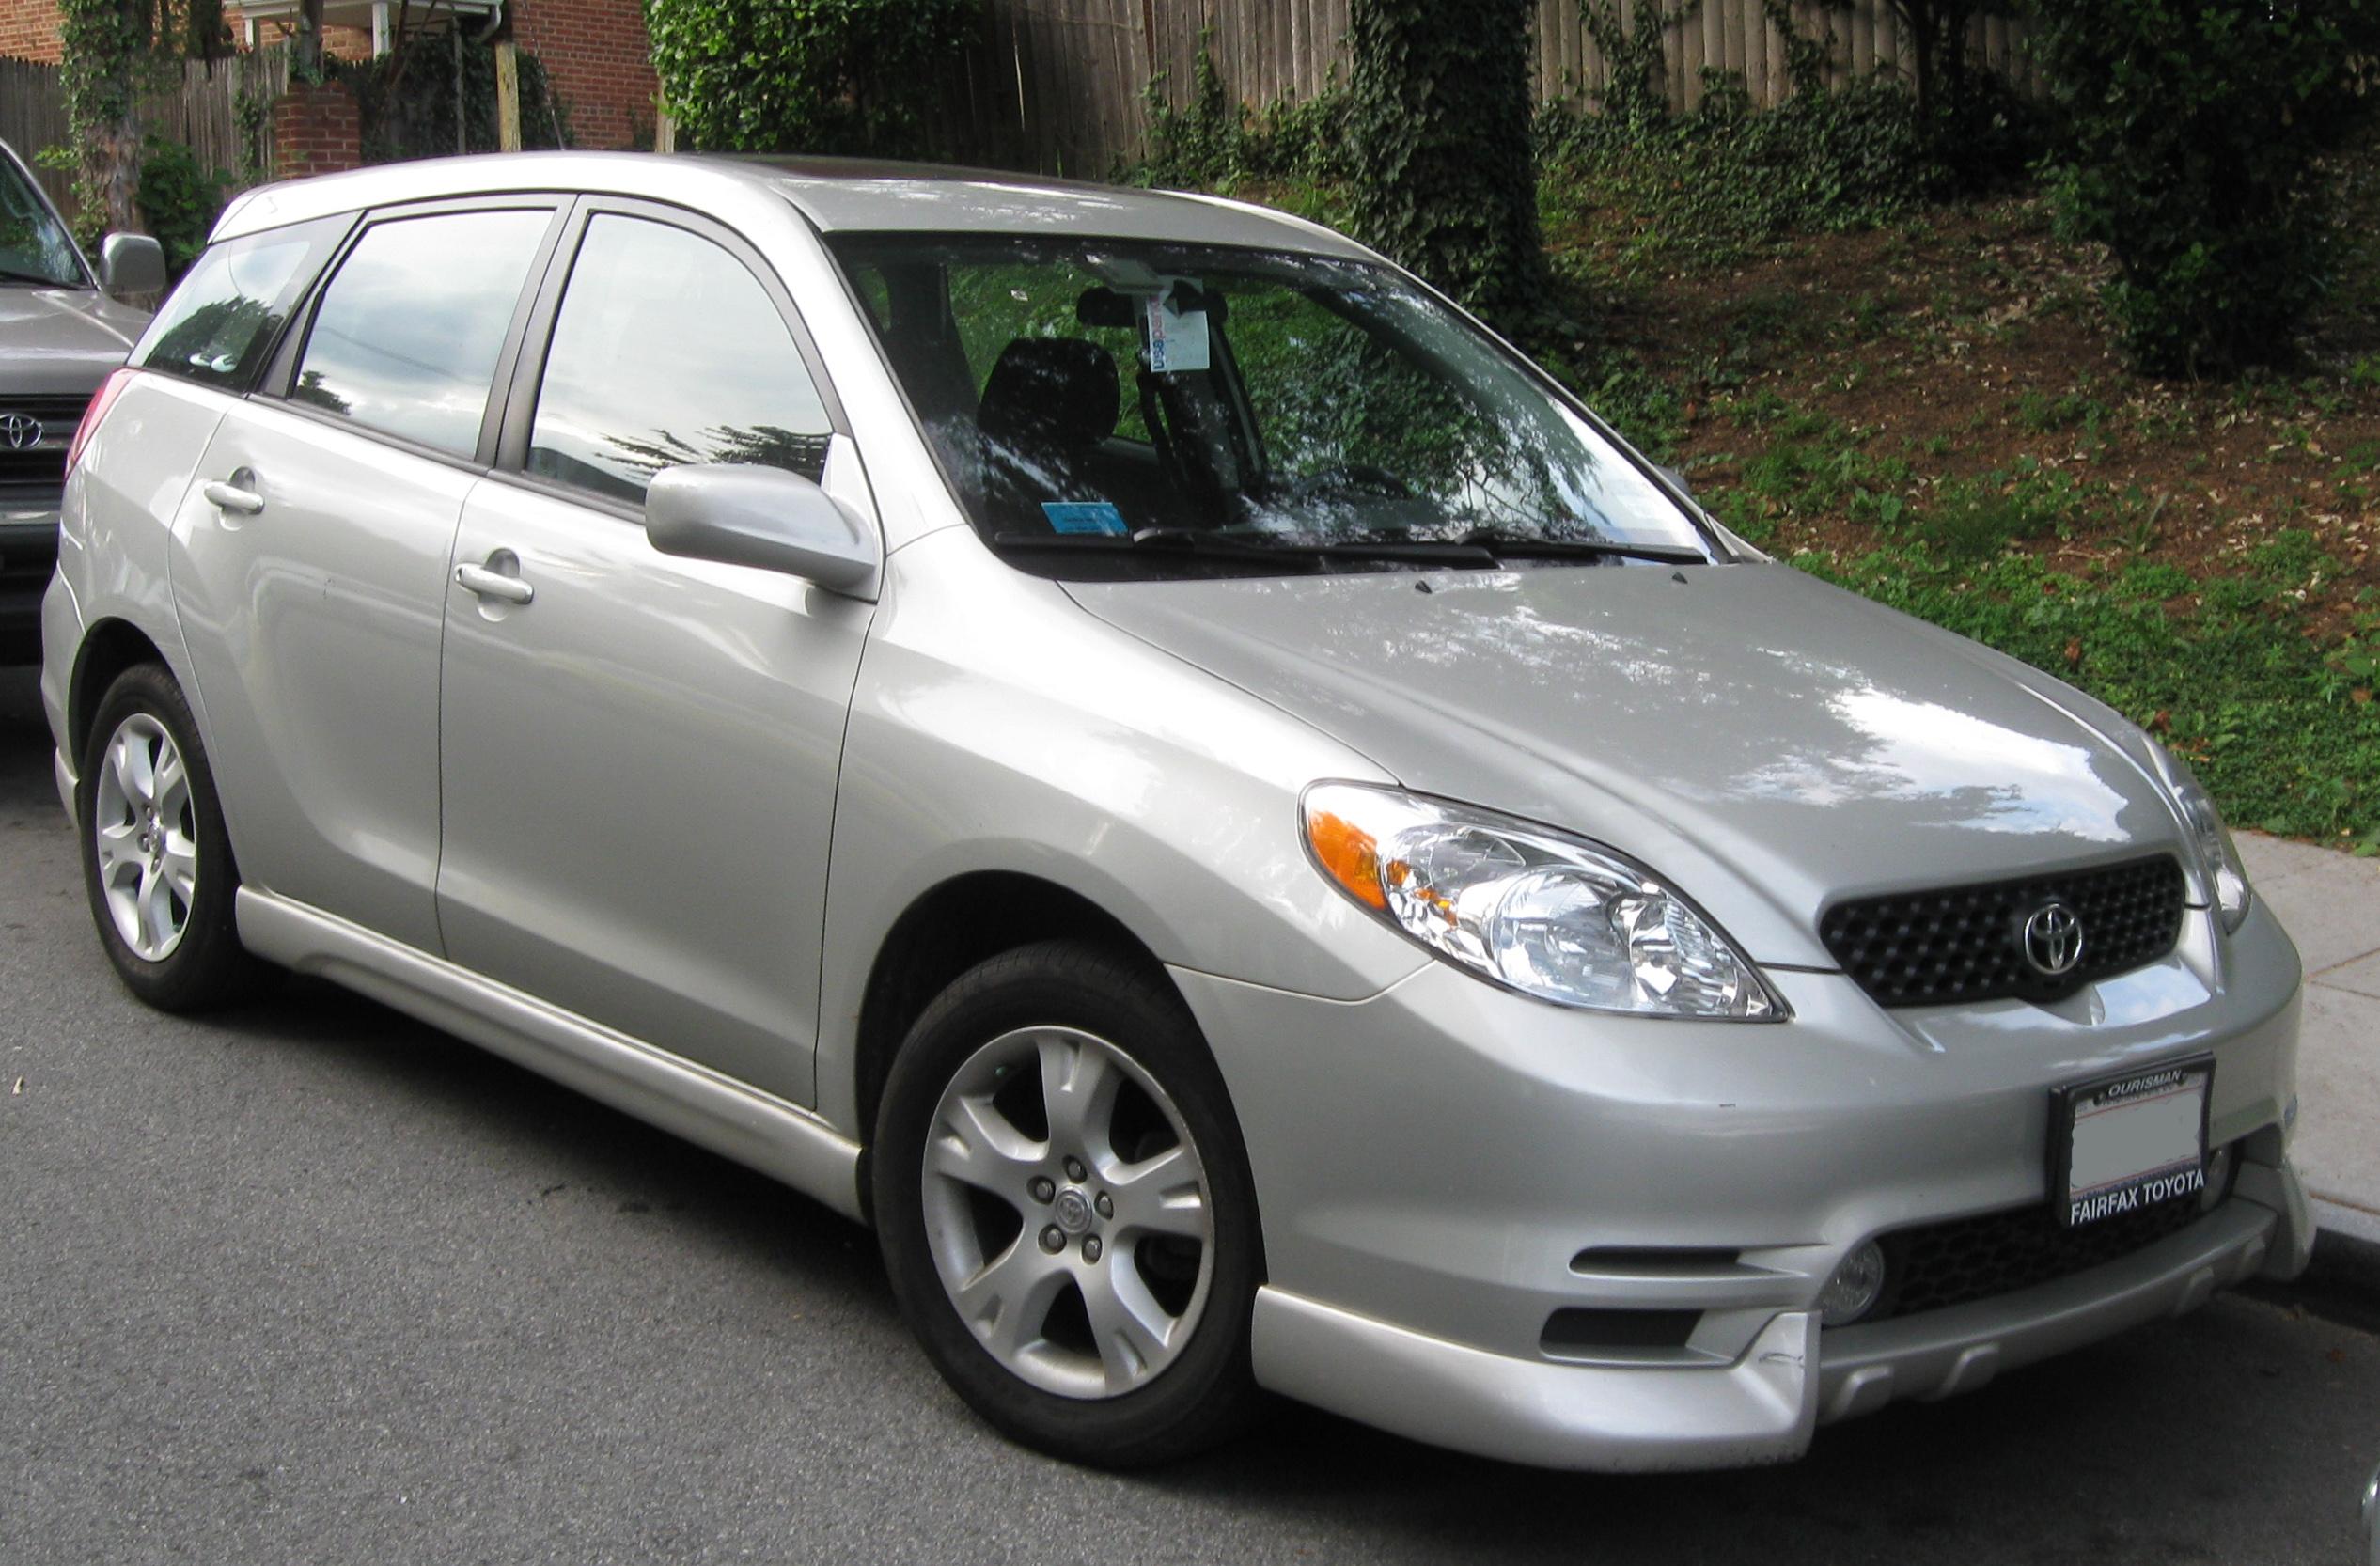 2009 Toyota Matrix Image 7